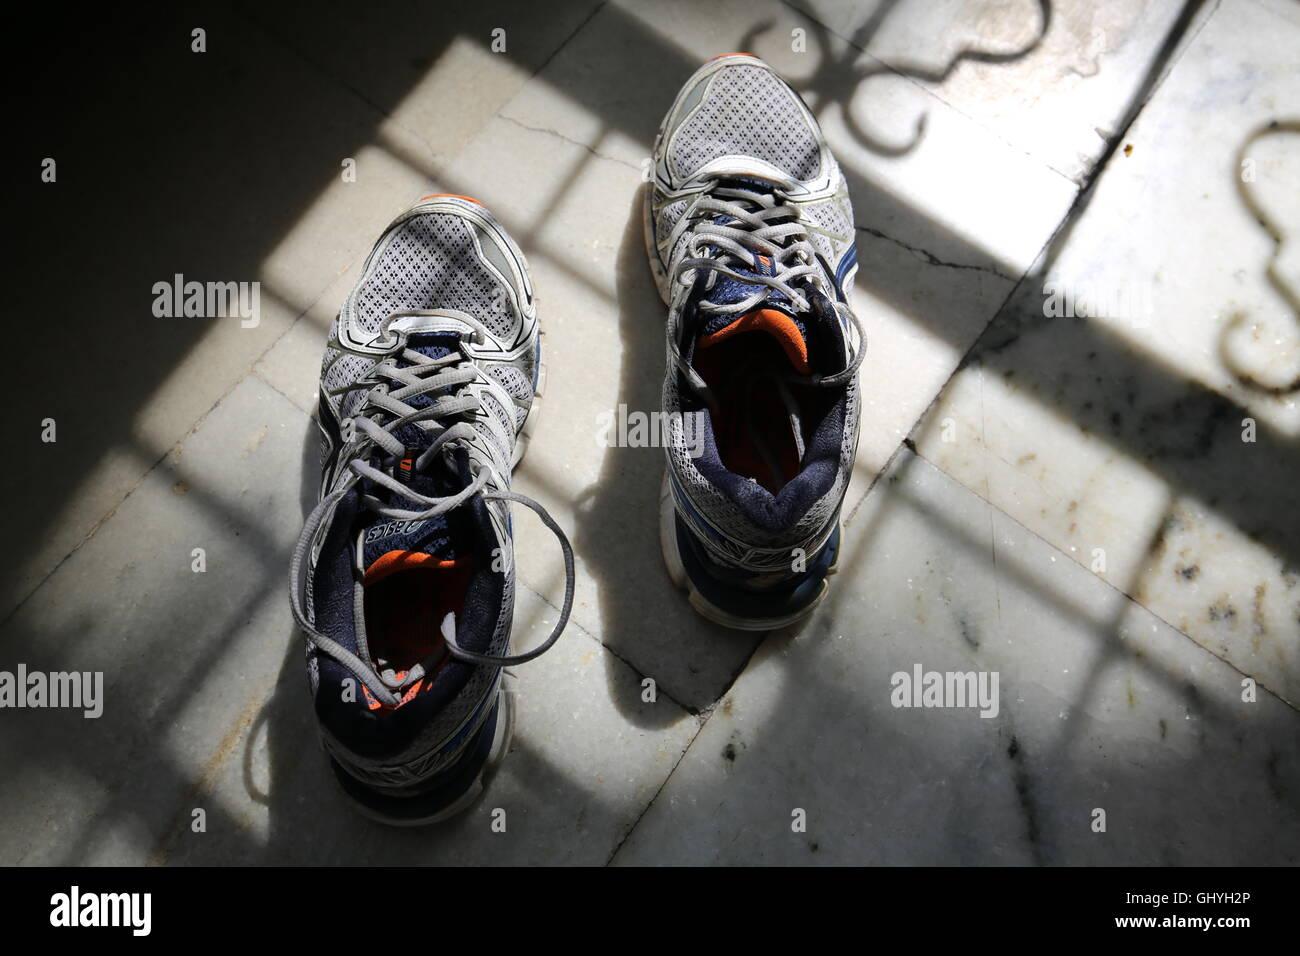 Asics Stockfotos & Asics Bilder Alamy